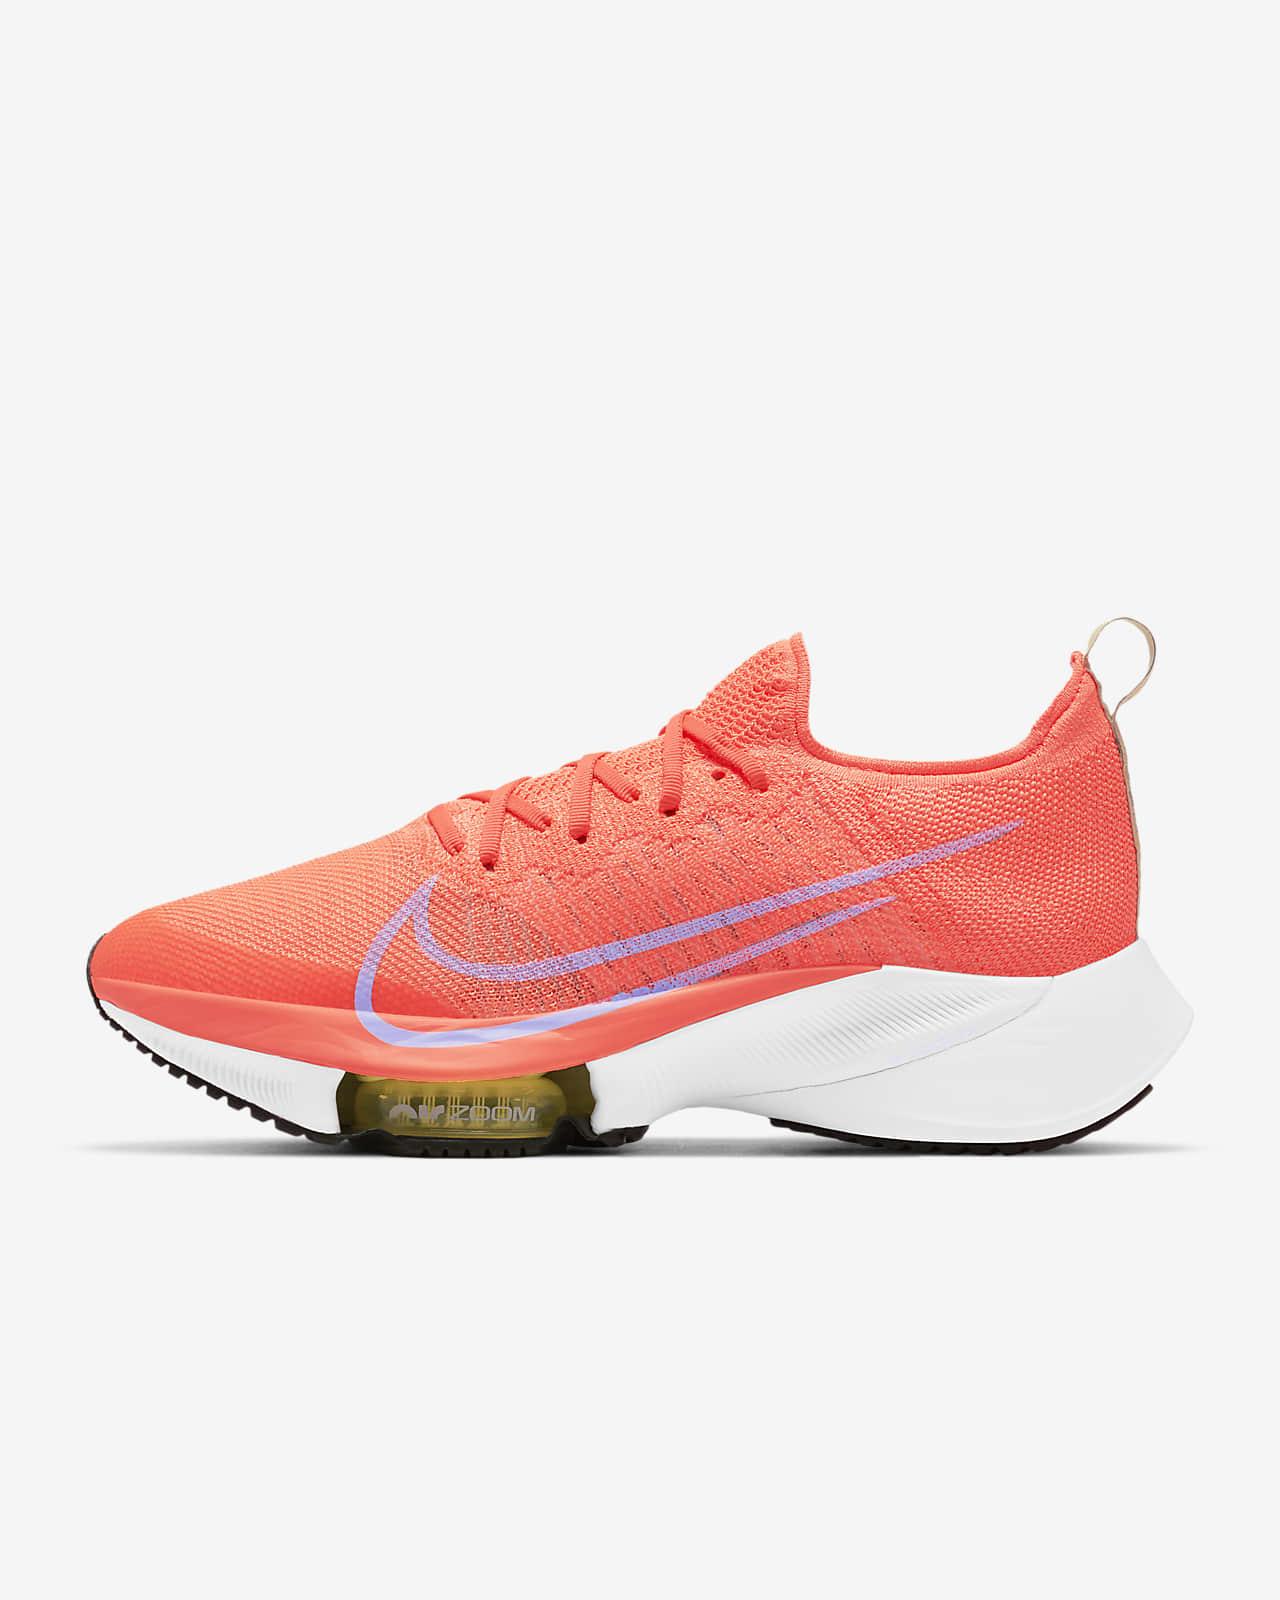 Löparsko Nike Air Zoom Tempo NEXT% för kvinnor